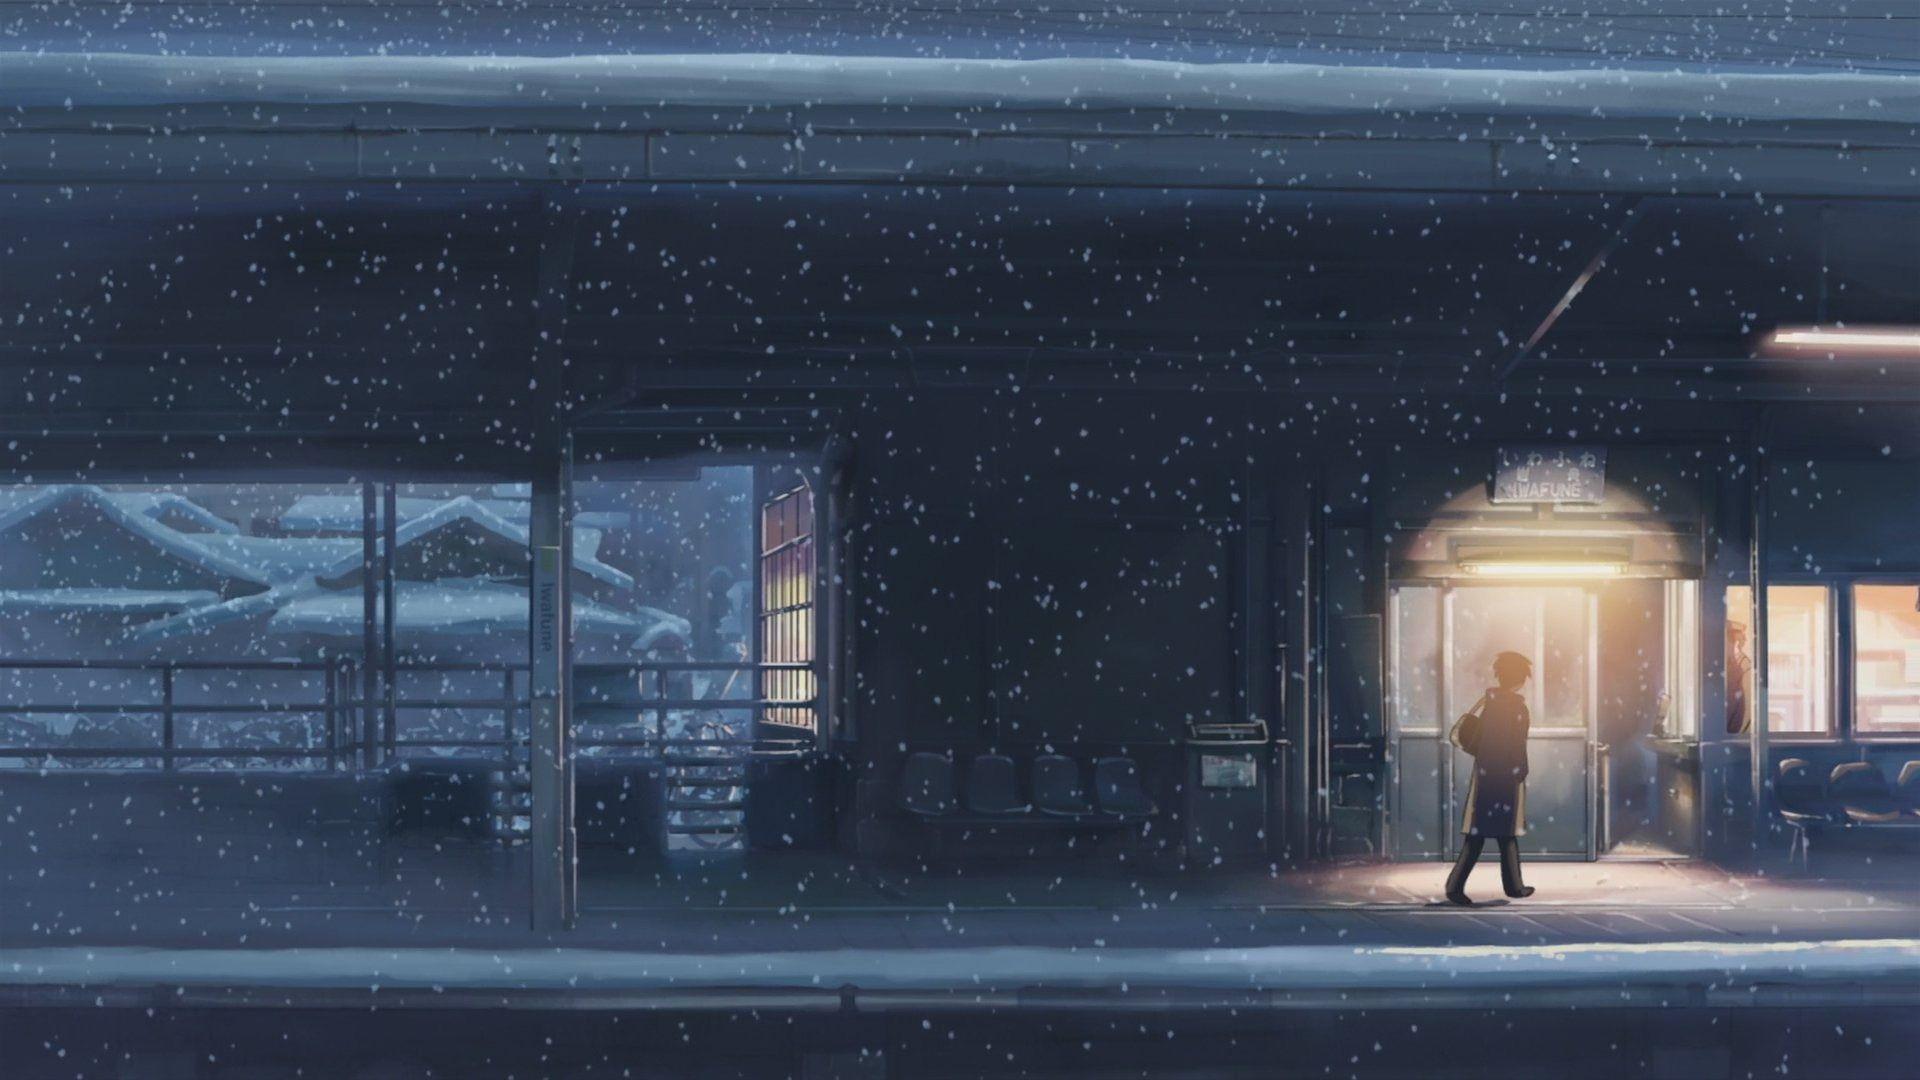 Aesthetic-Anime-Desktop-Wallpapers-Top-F